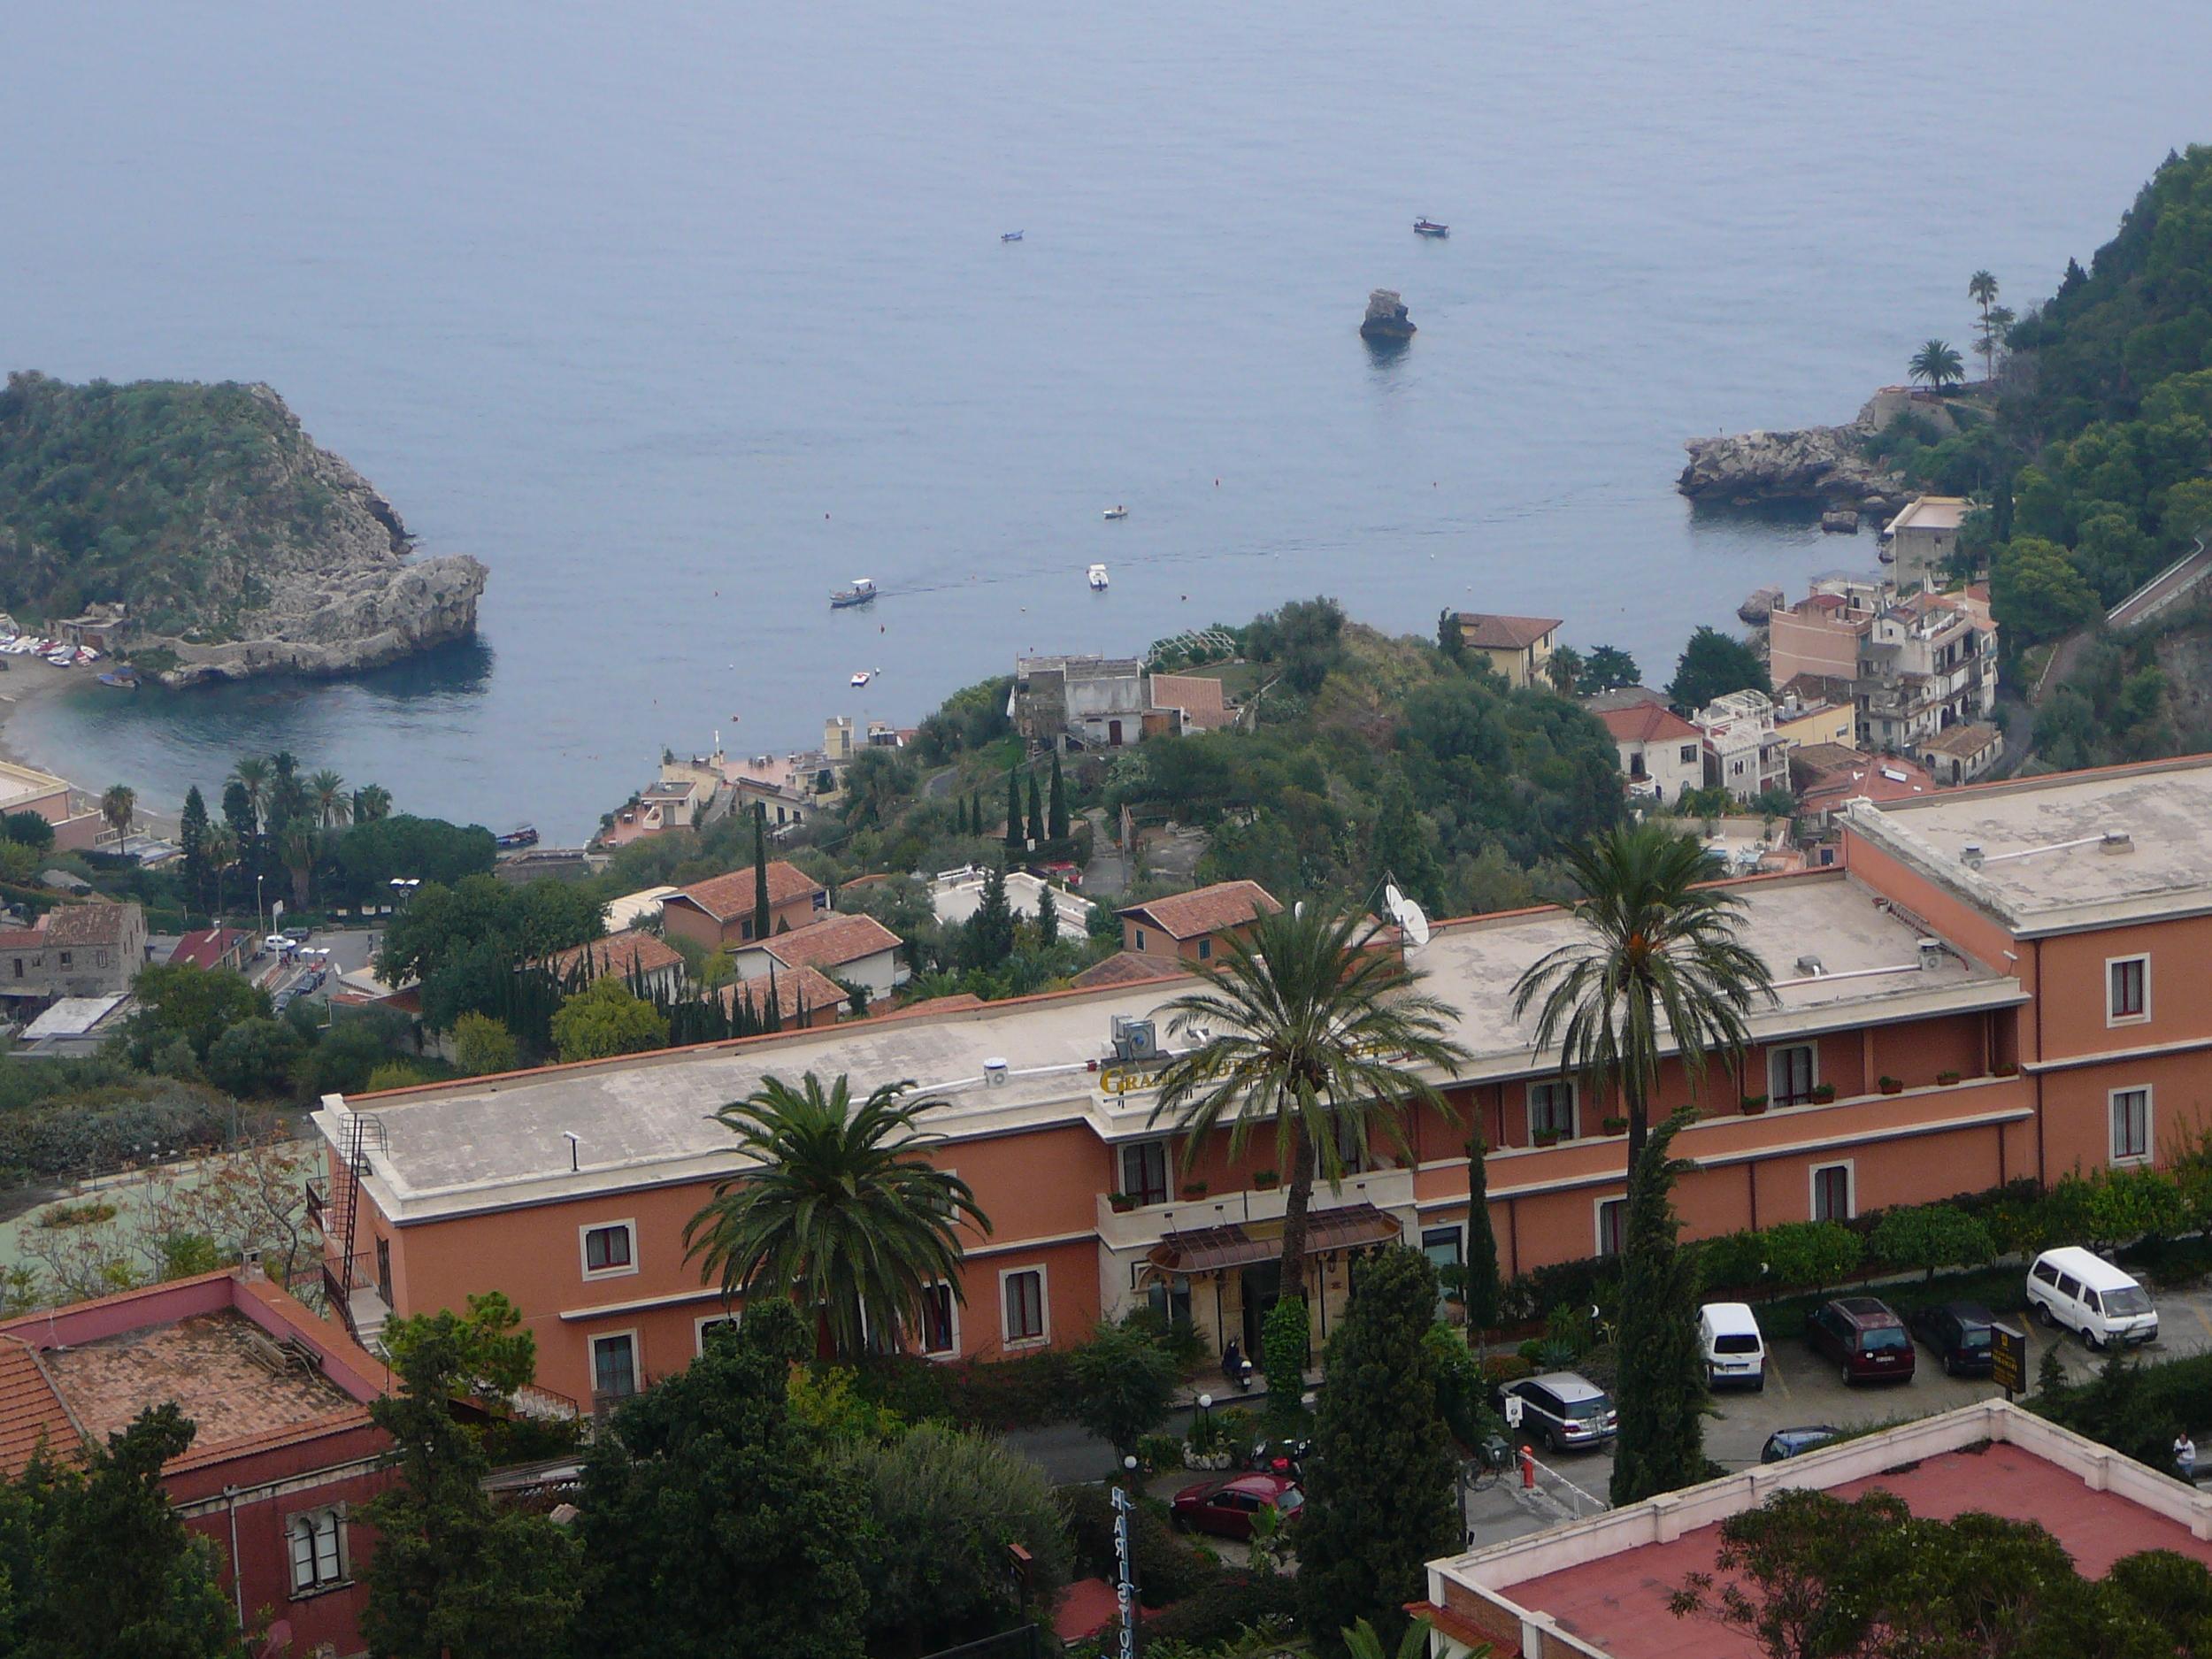 CRO Italy web 2008 - 11.JPG